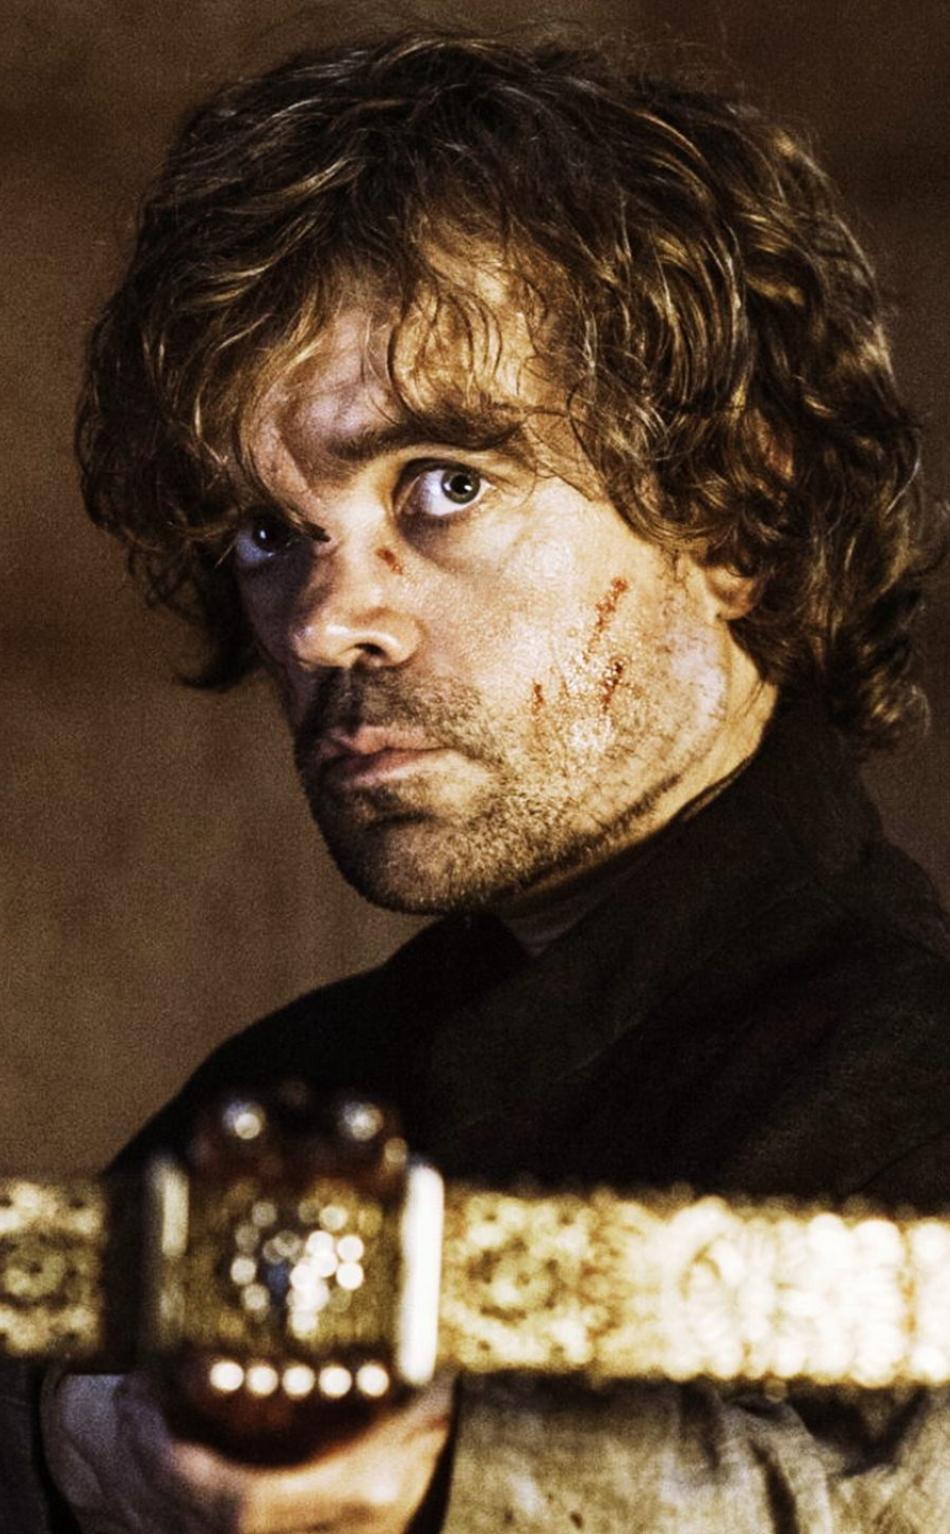 Game Of Thrones Season 4 Peter Dinklage Photoshoot, Full ...